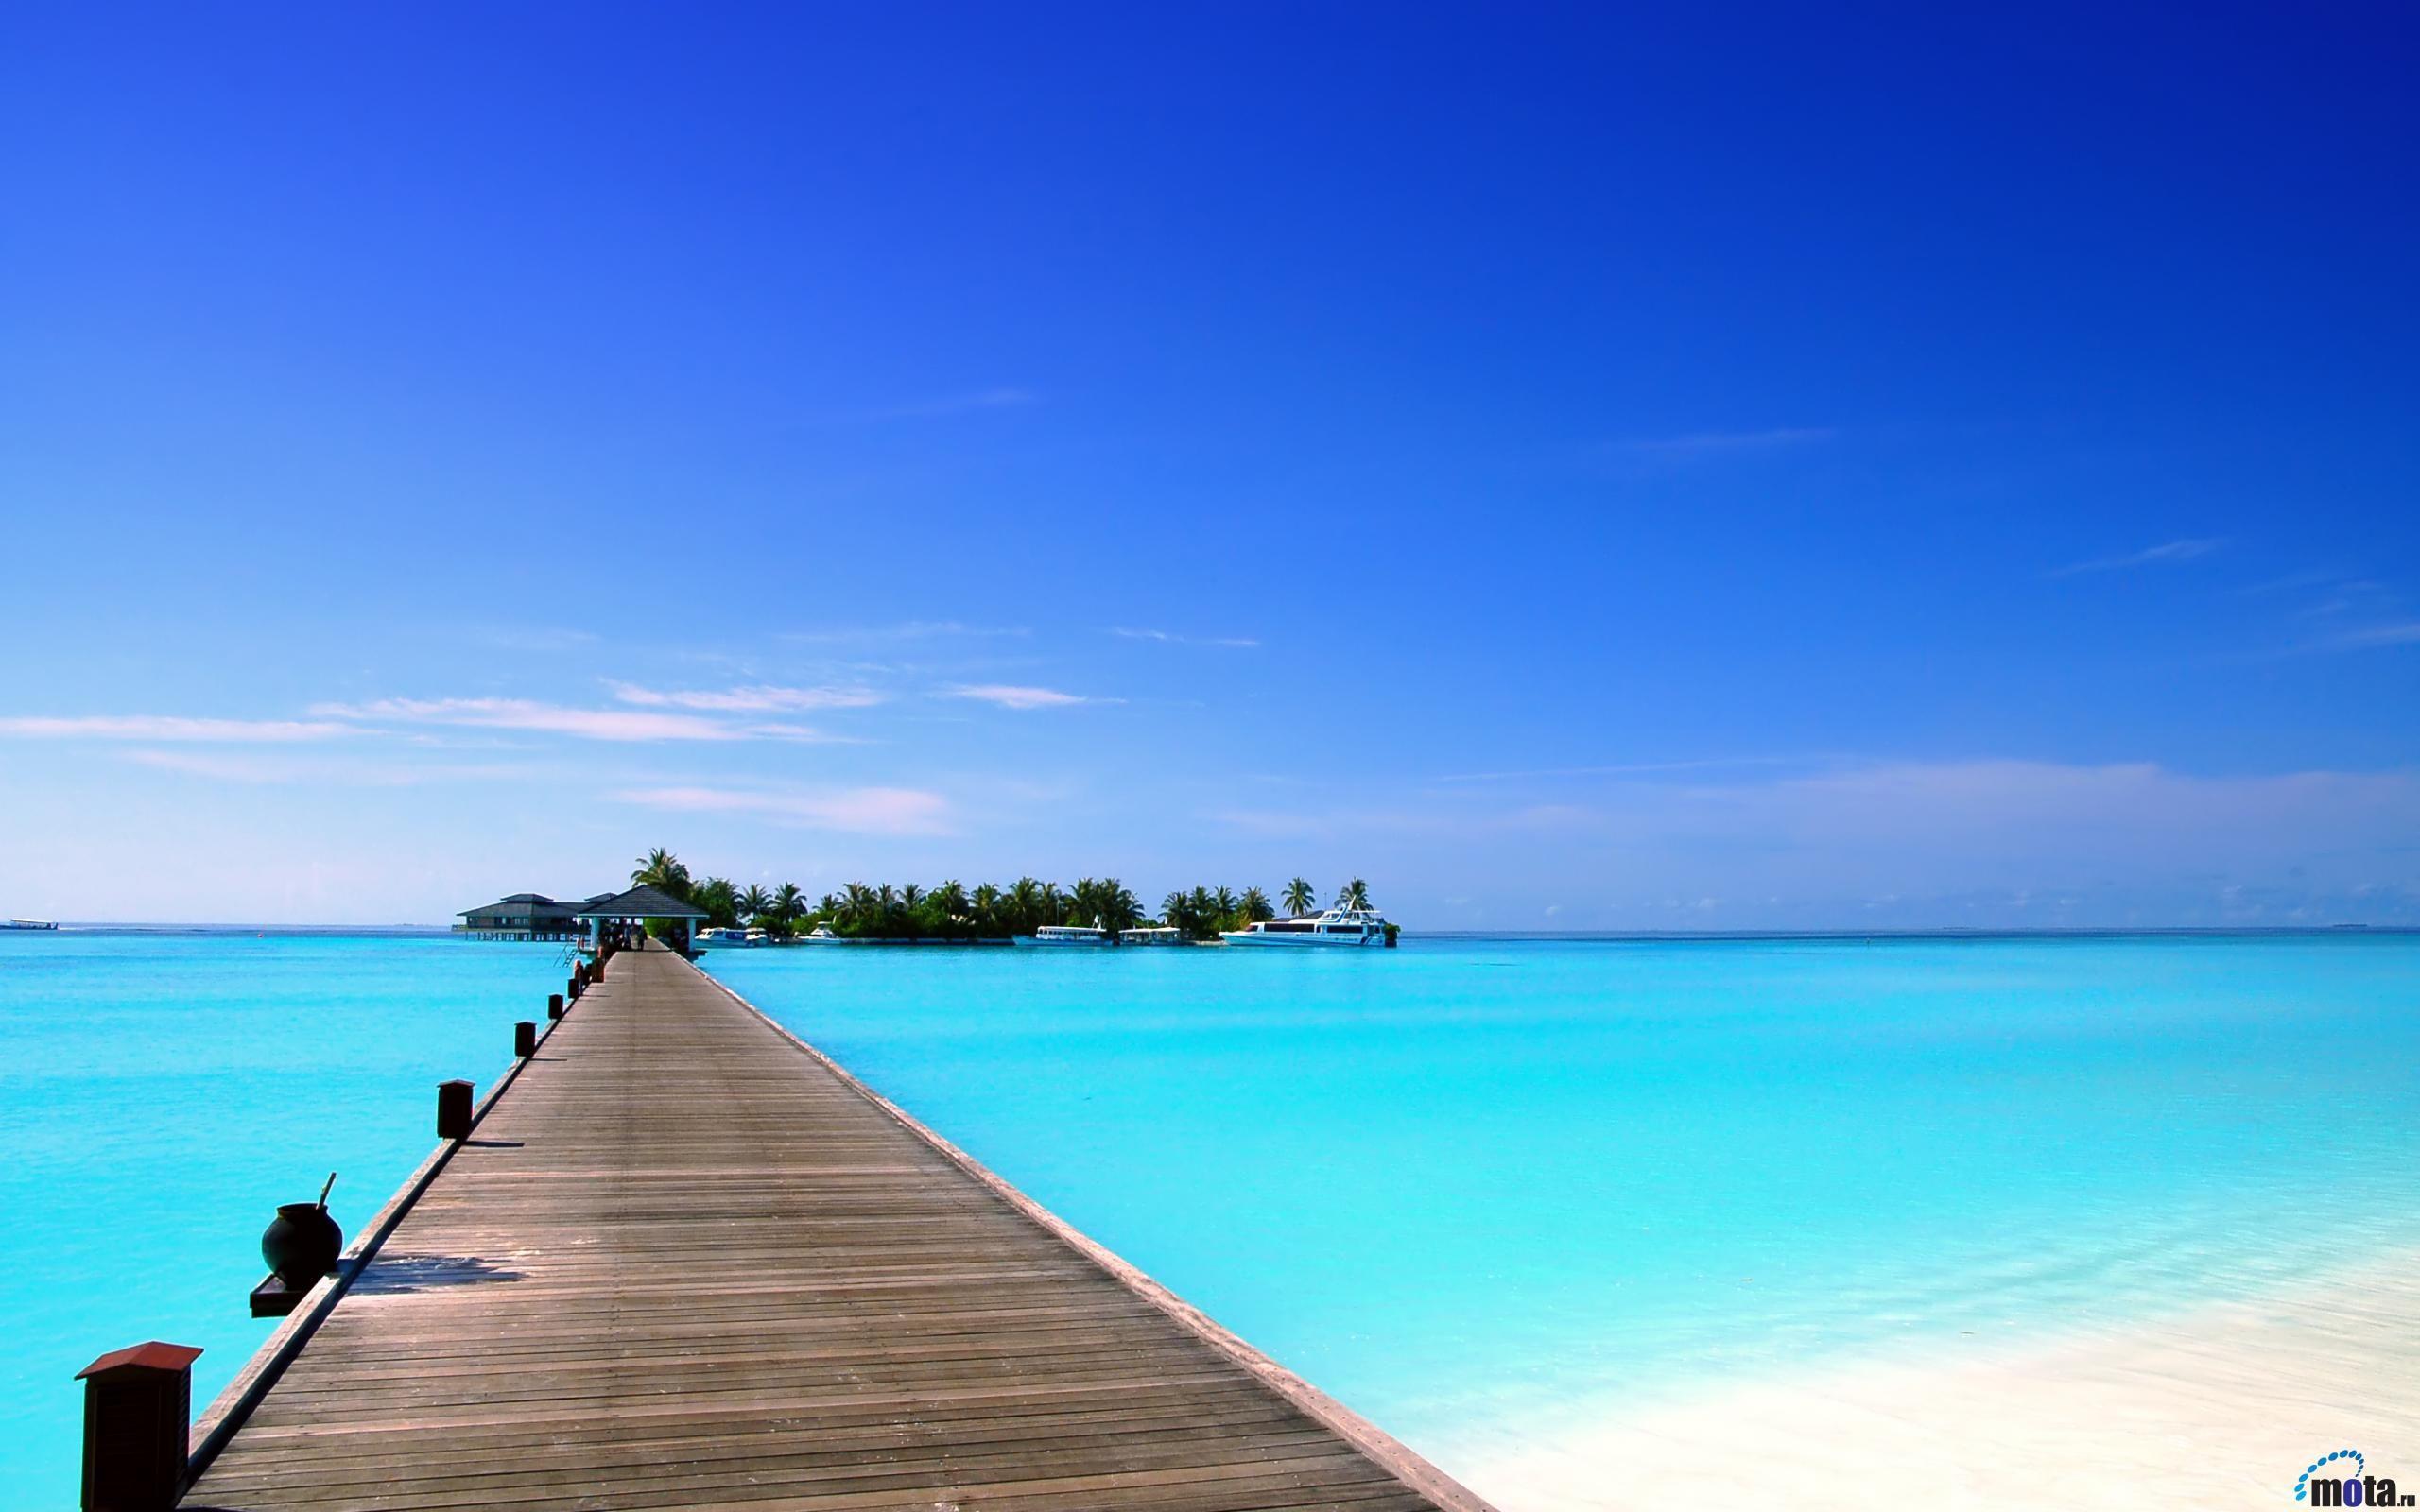 Desktop Wallpapers Sun Island Hotel Maldives Islands